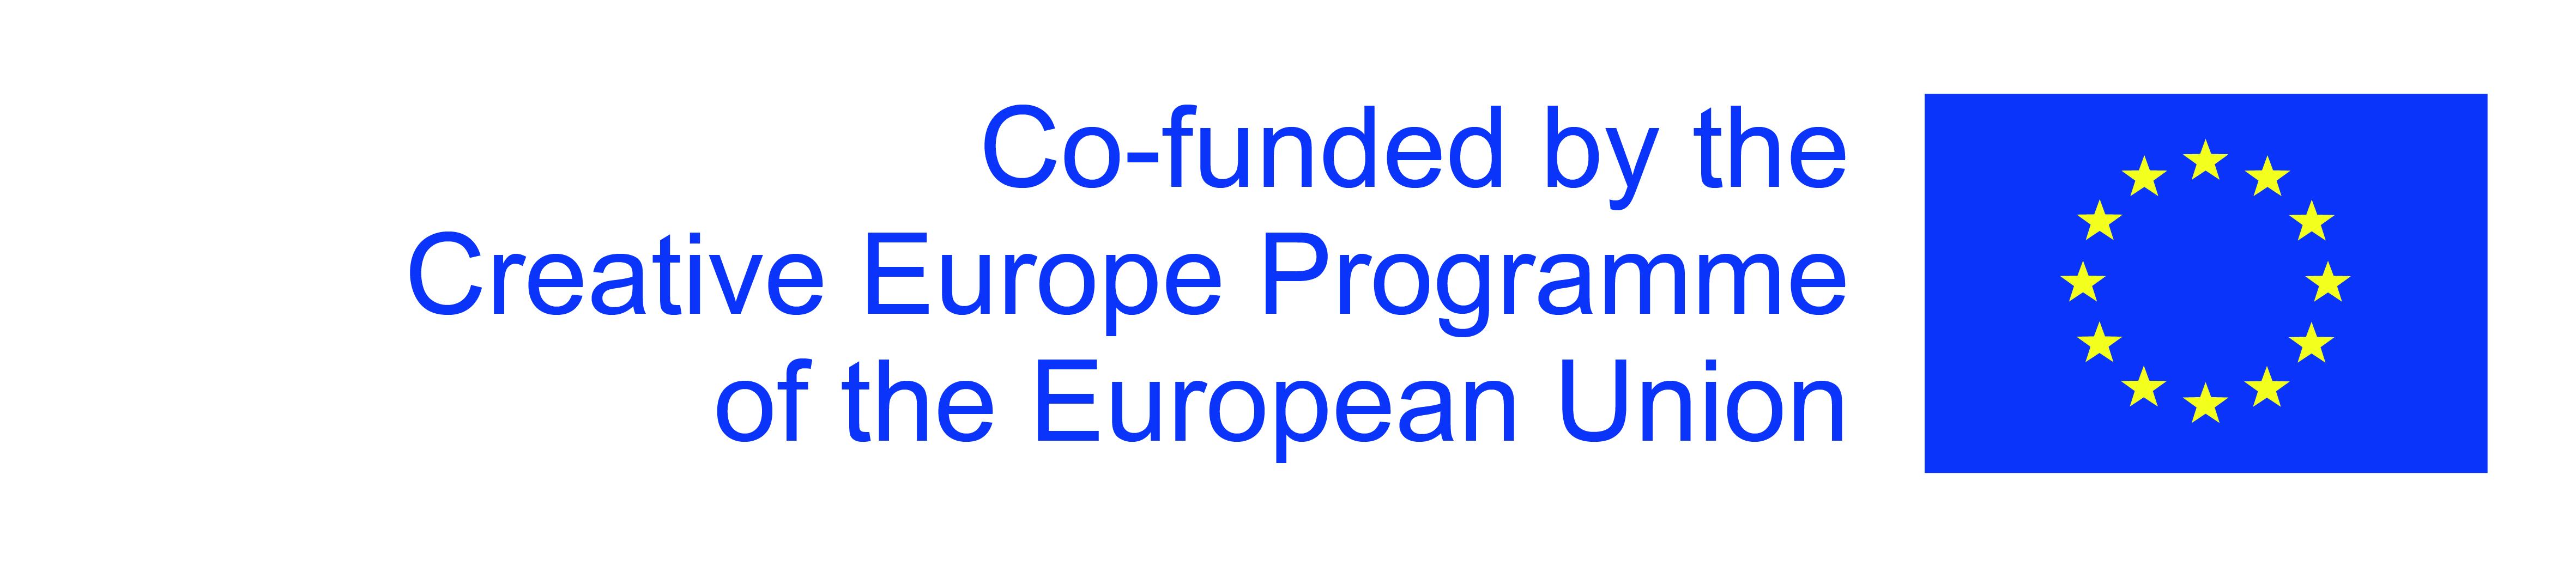 Creative Europe funding logo Sept 12